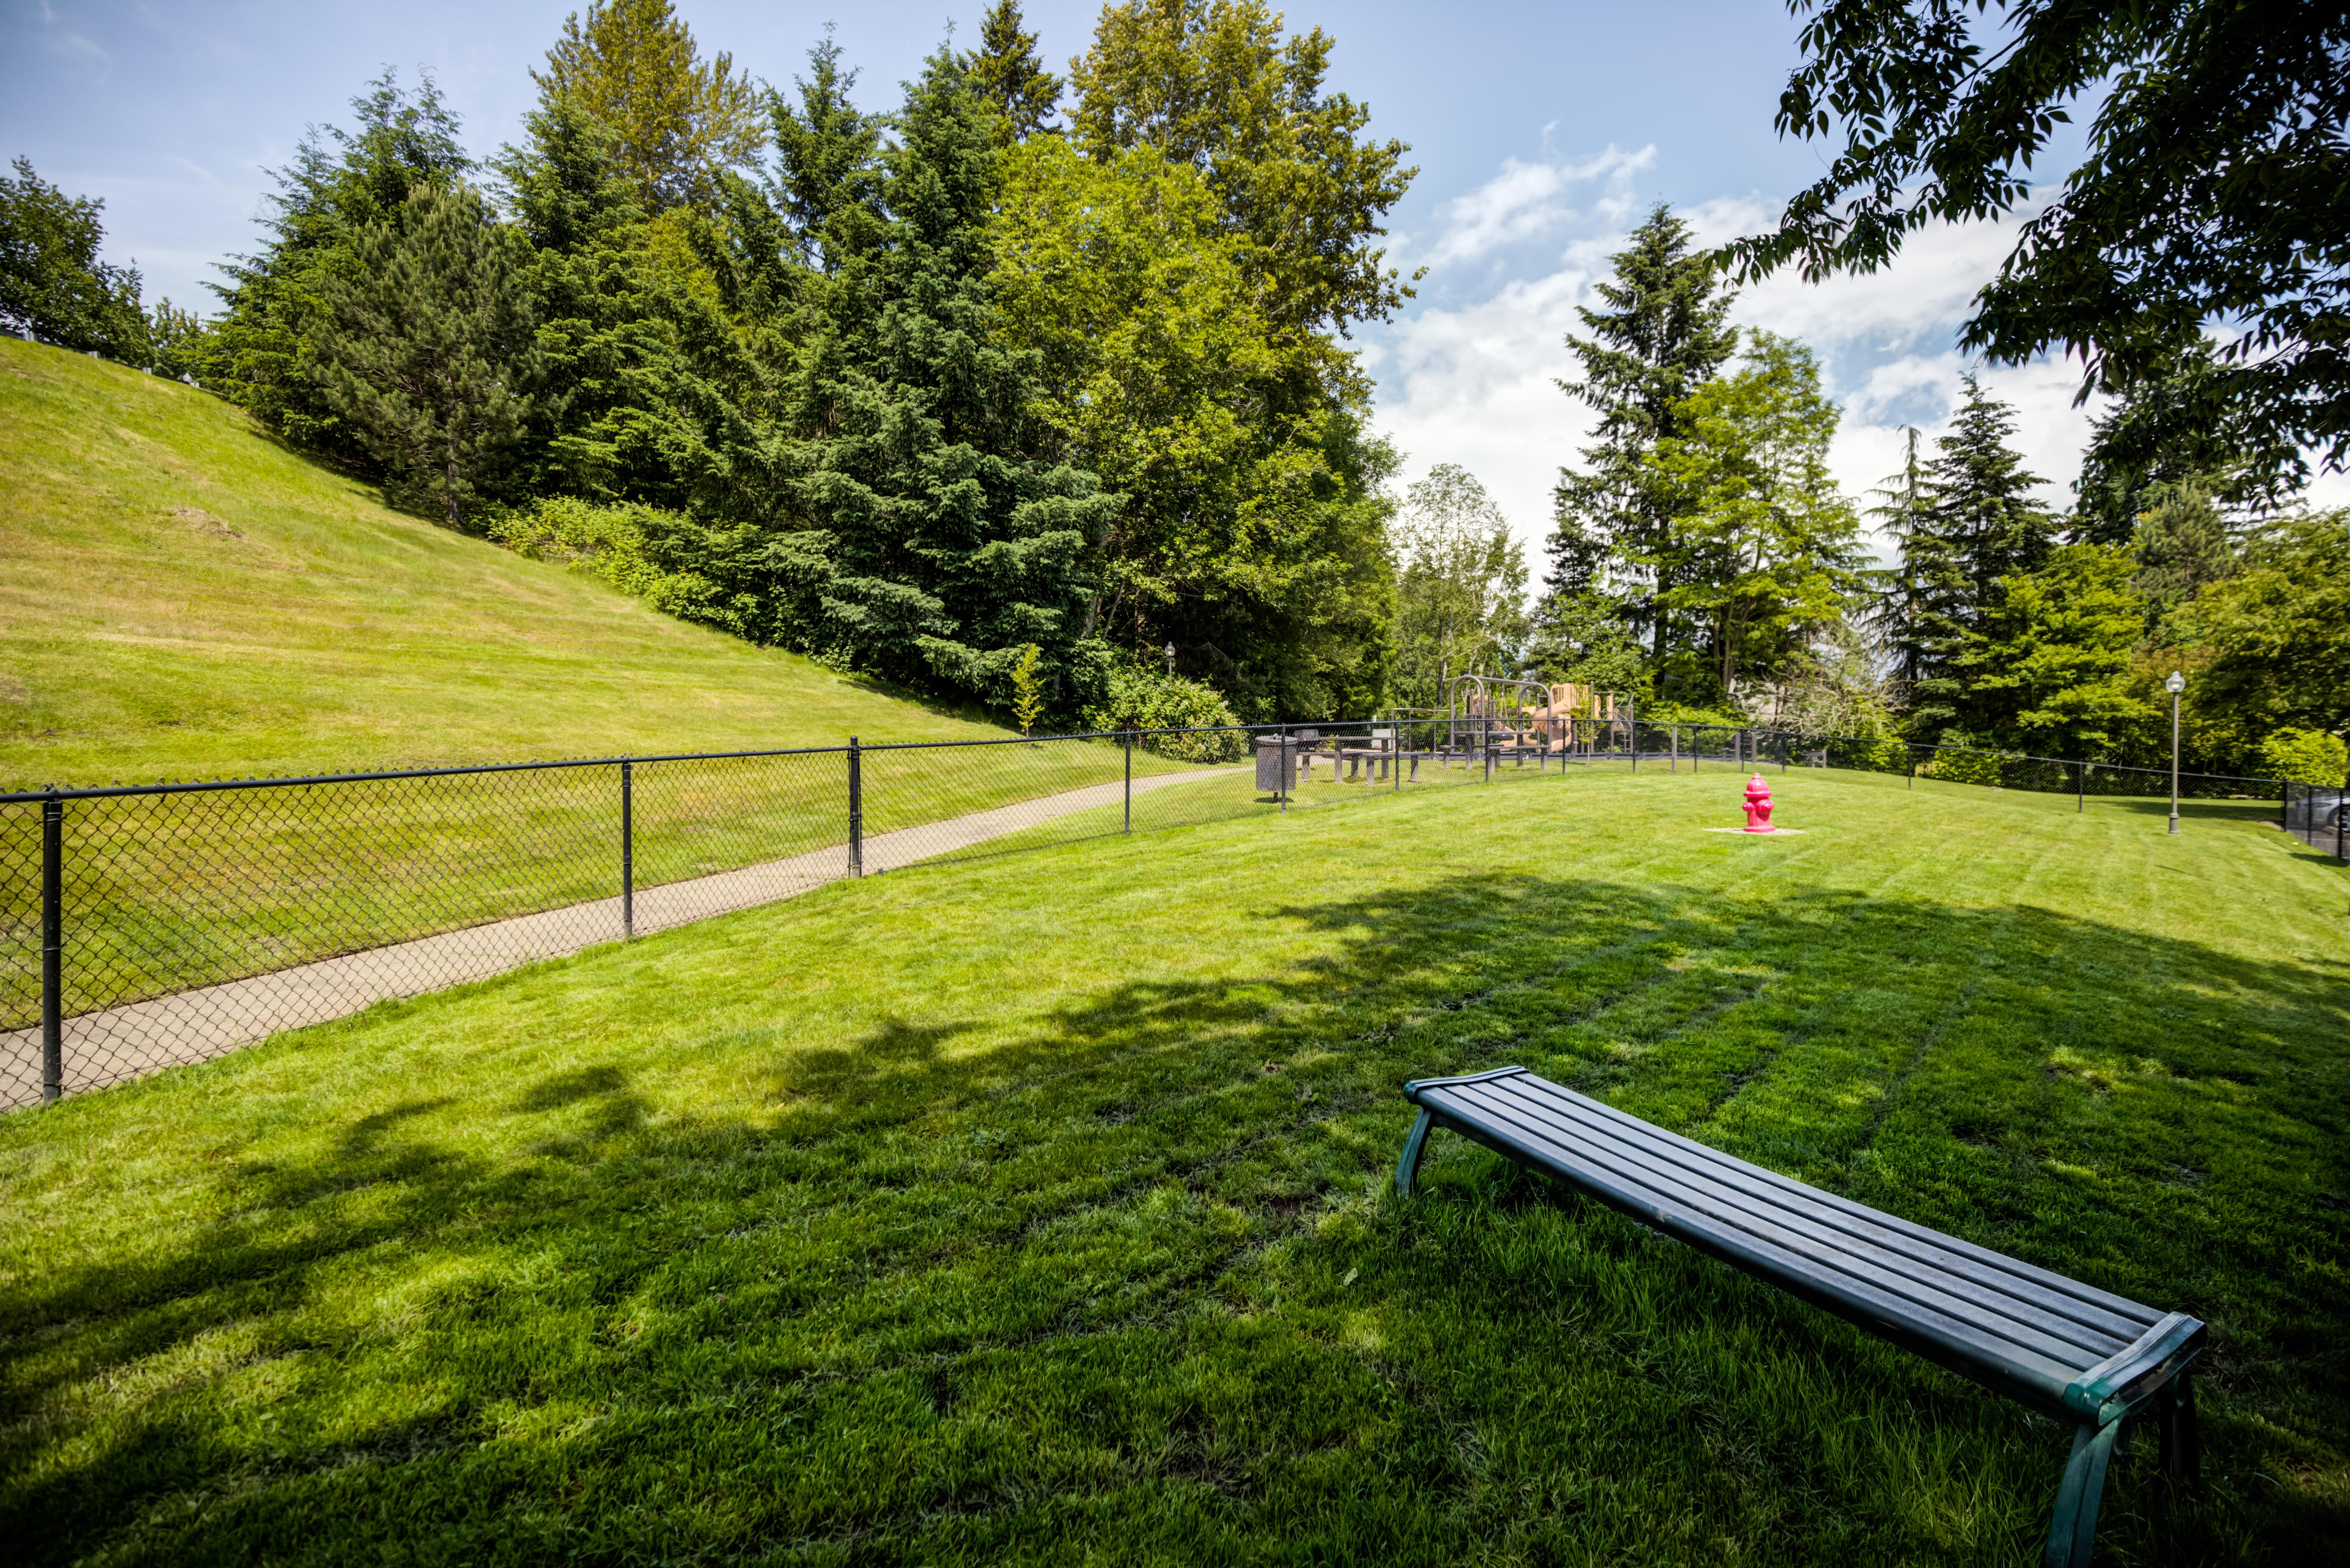 Onsite dog park at The Knolls at Inglewood Hill in Sammamish, Washington